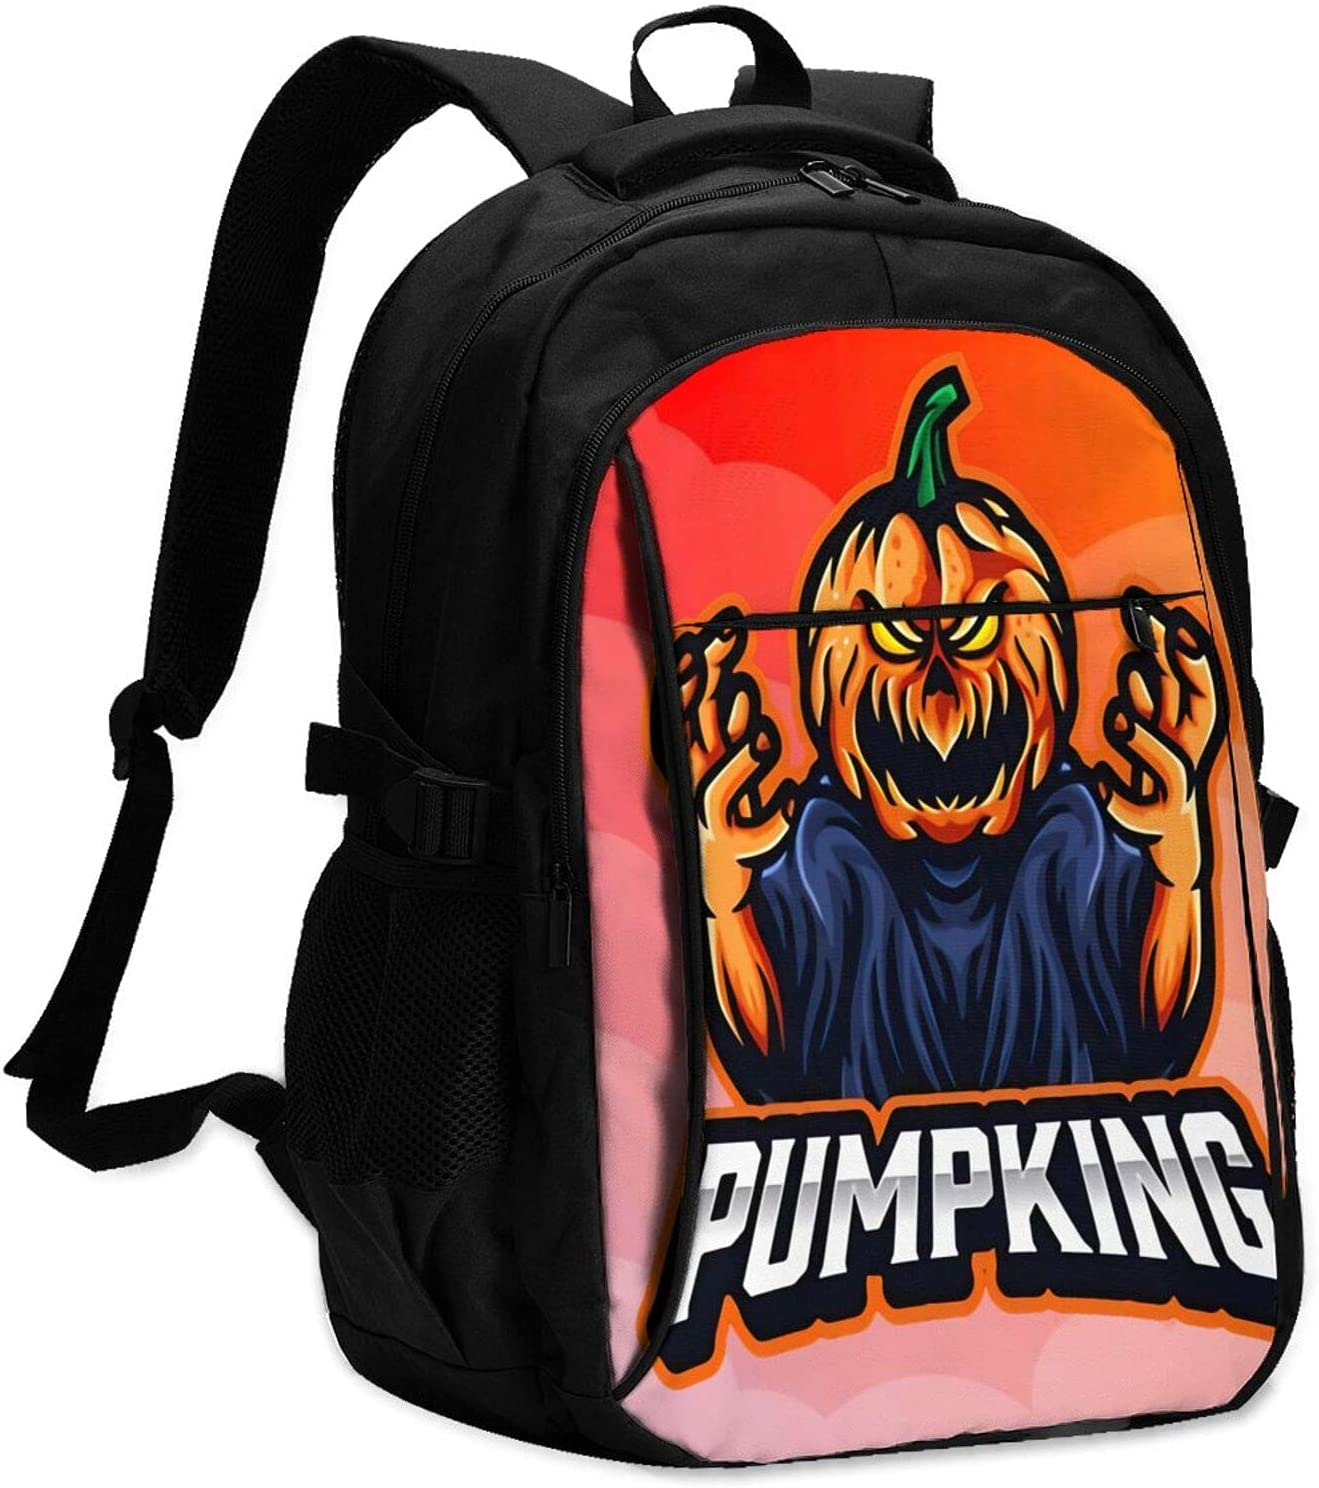 Halloween Pumpkin Fashionable 2021 Max 88% OFF spring and summer new Computer Usb Laptop School Backpac